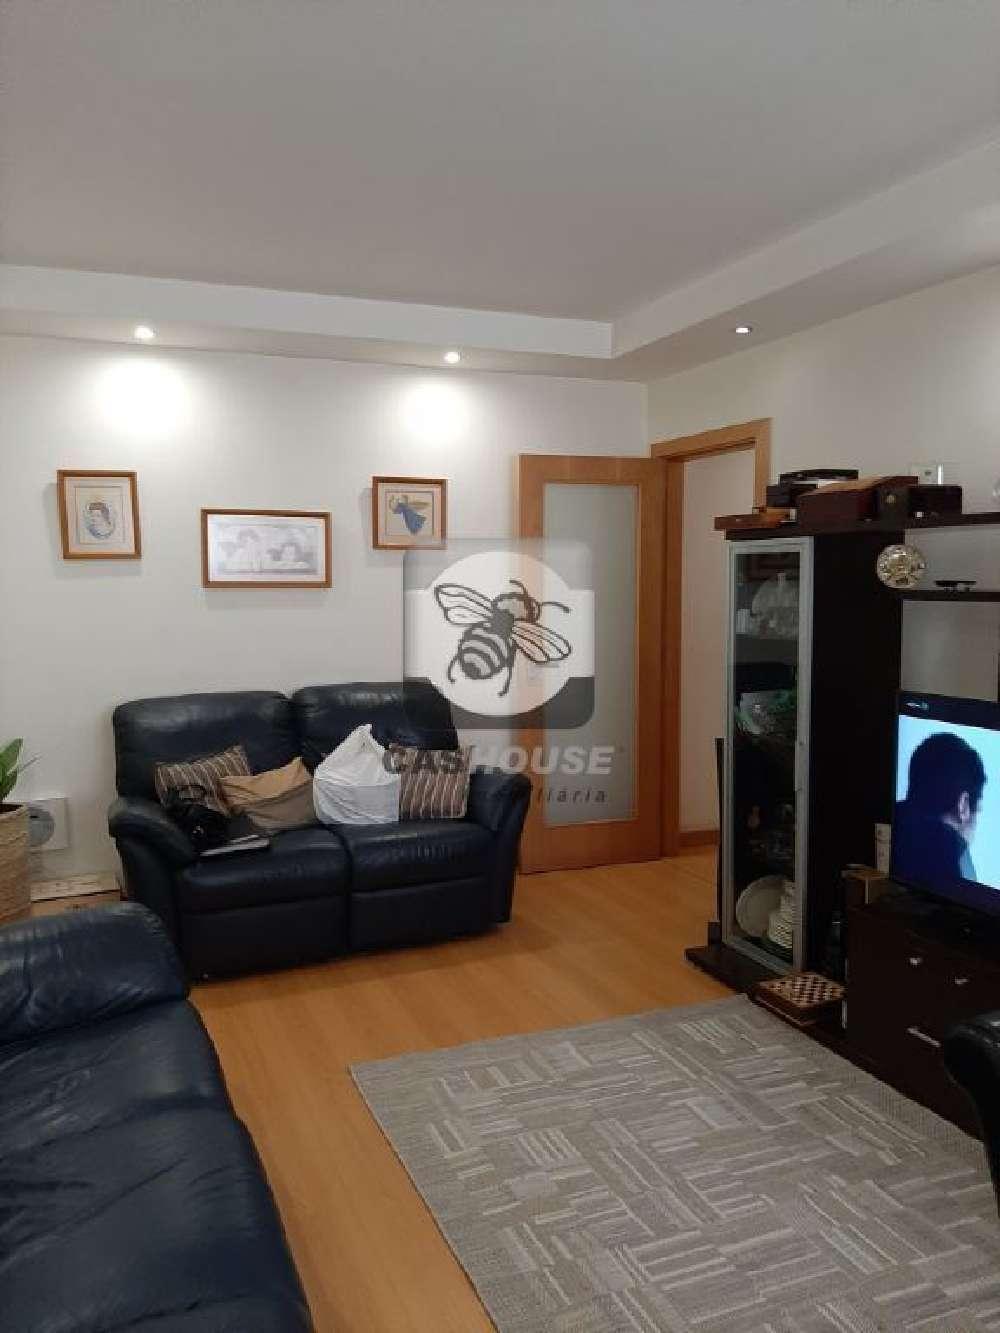 Arcozelo Vila Nova De Gaia apartment picture 139647